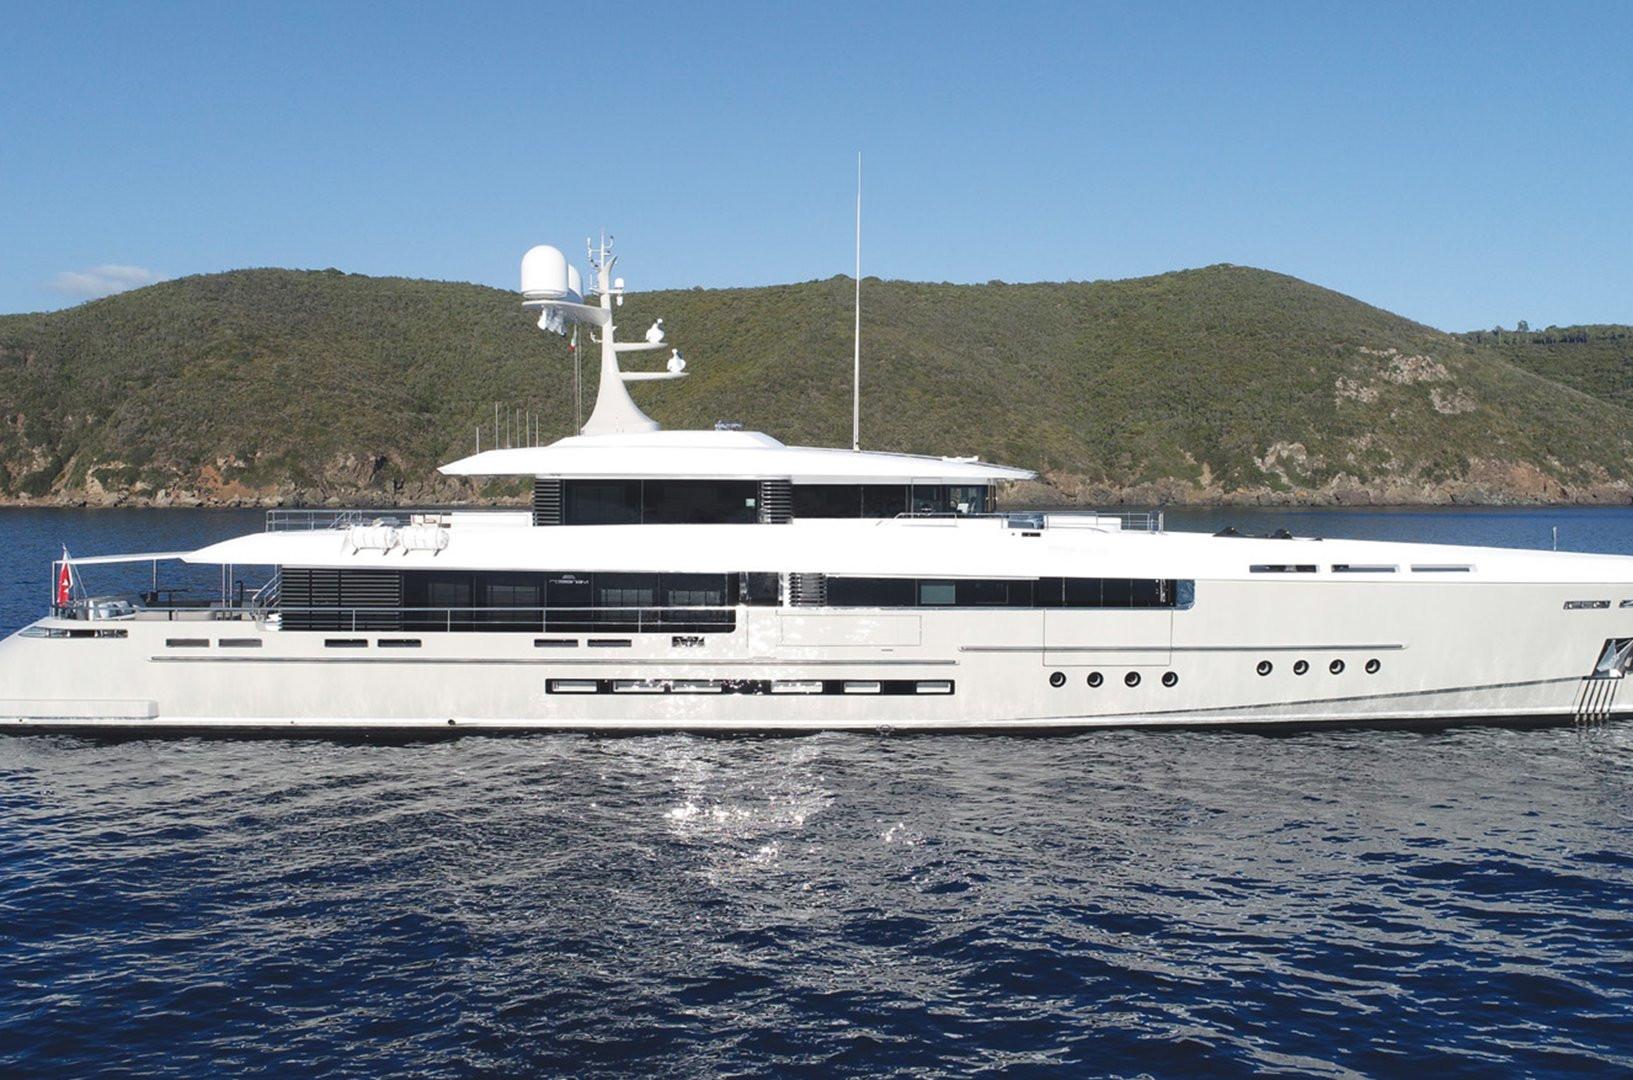 Yacht ENDEAVOUR 2 - 50m Rossinavi tri-deck explorer yacht for charter